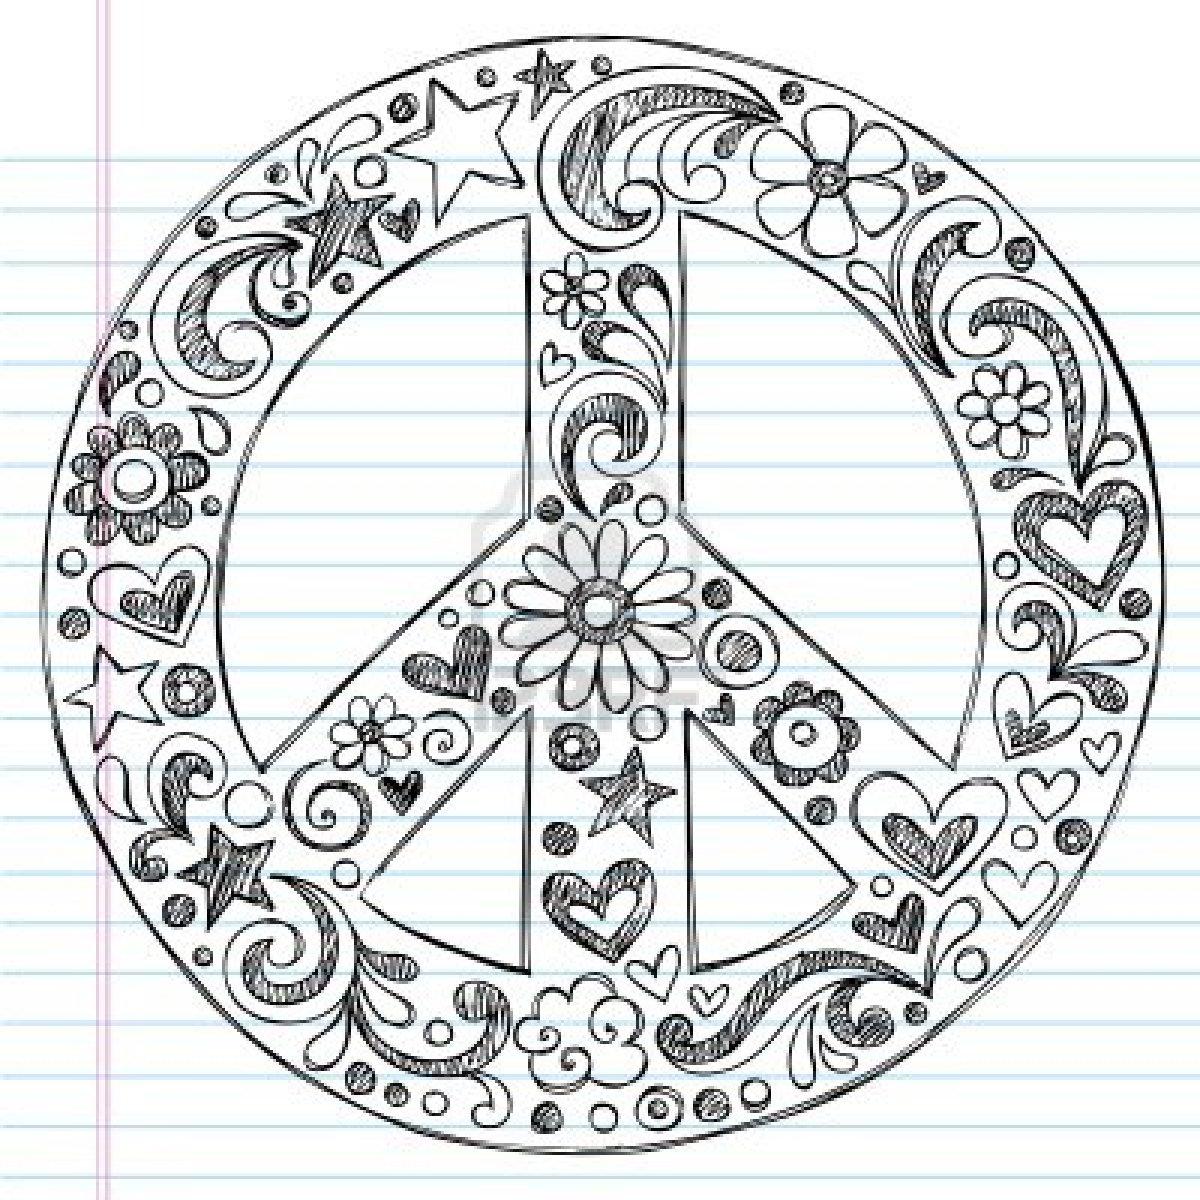 Drawn amd peace Hand love Hand  Printable